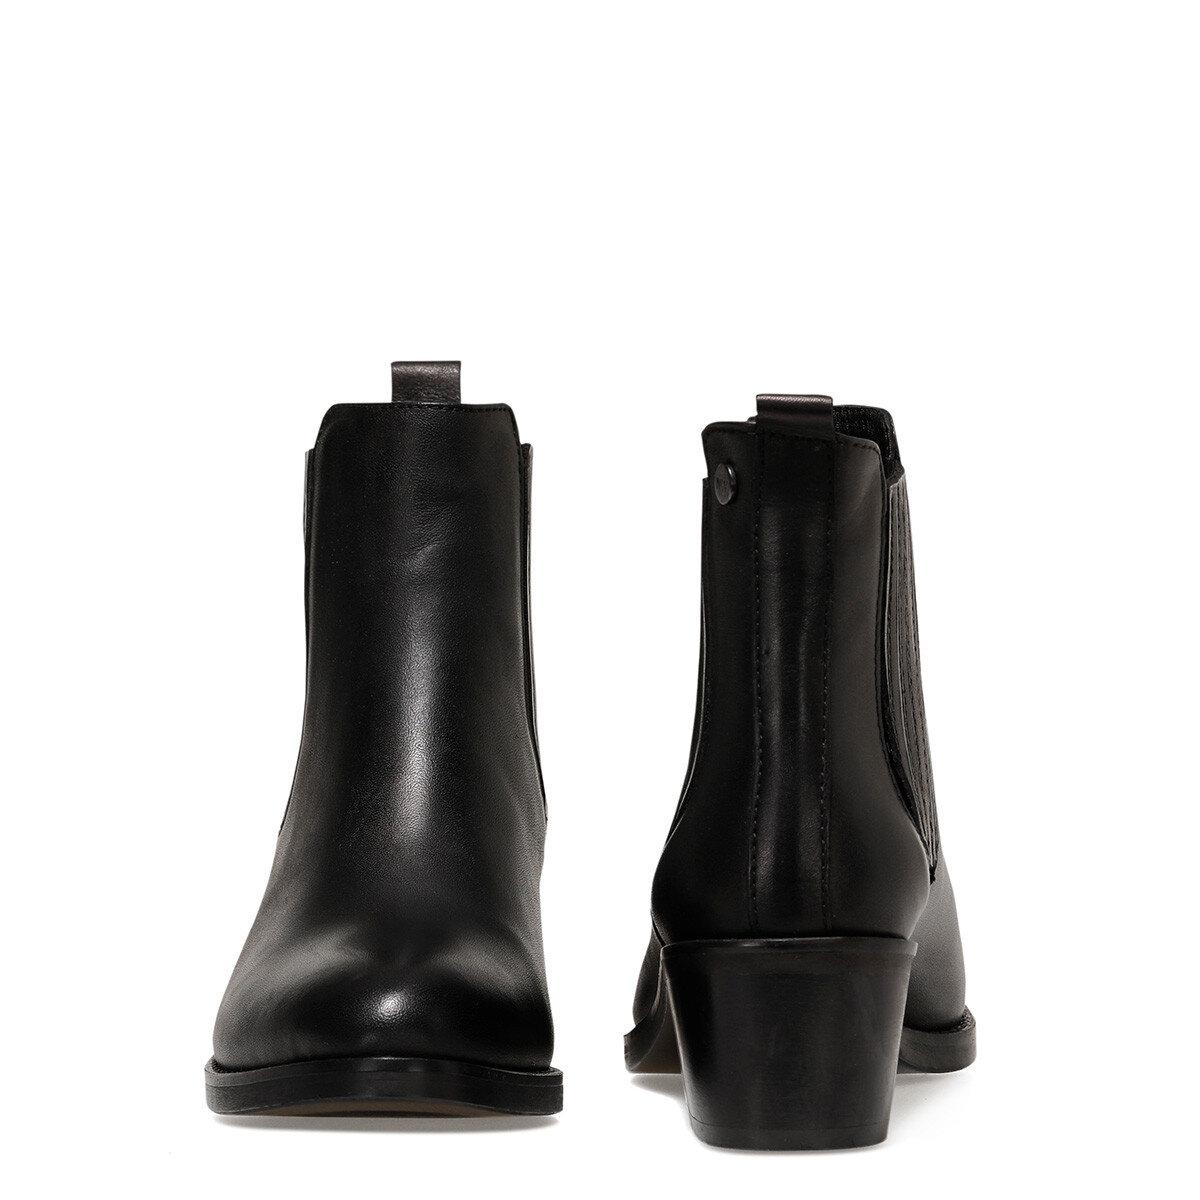 OSME Siyah Kadın Topuklu Bot